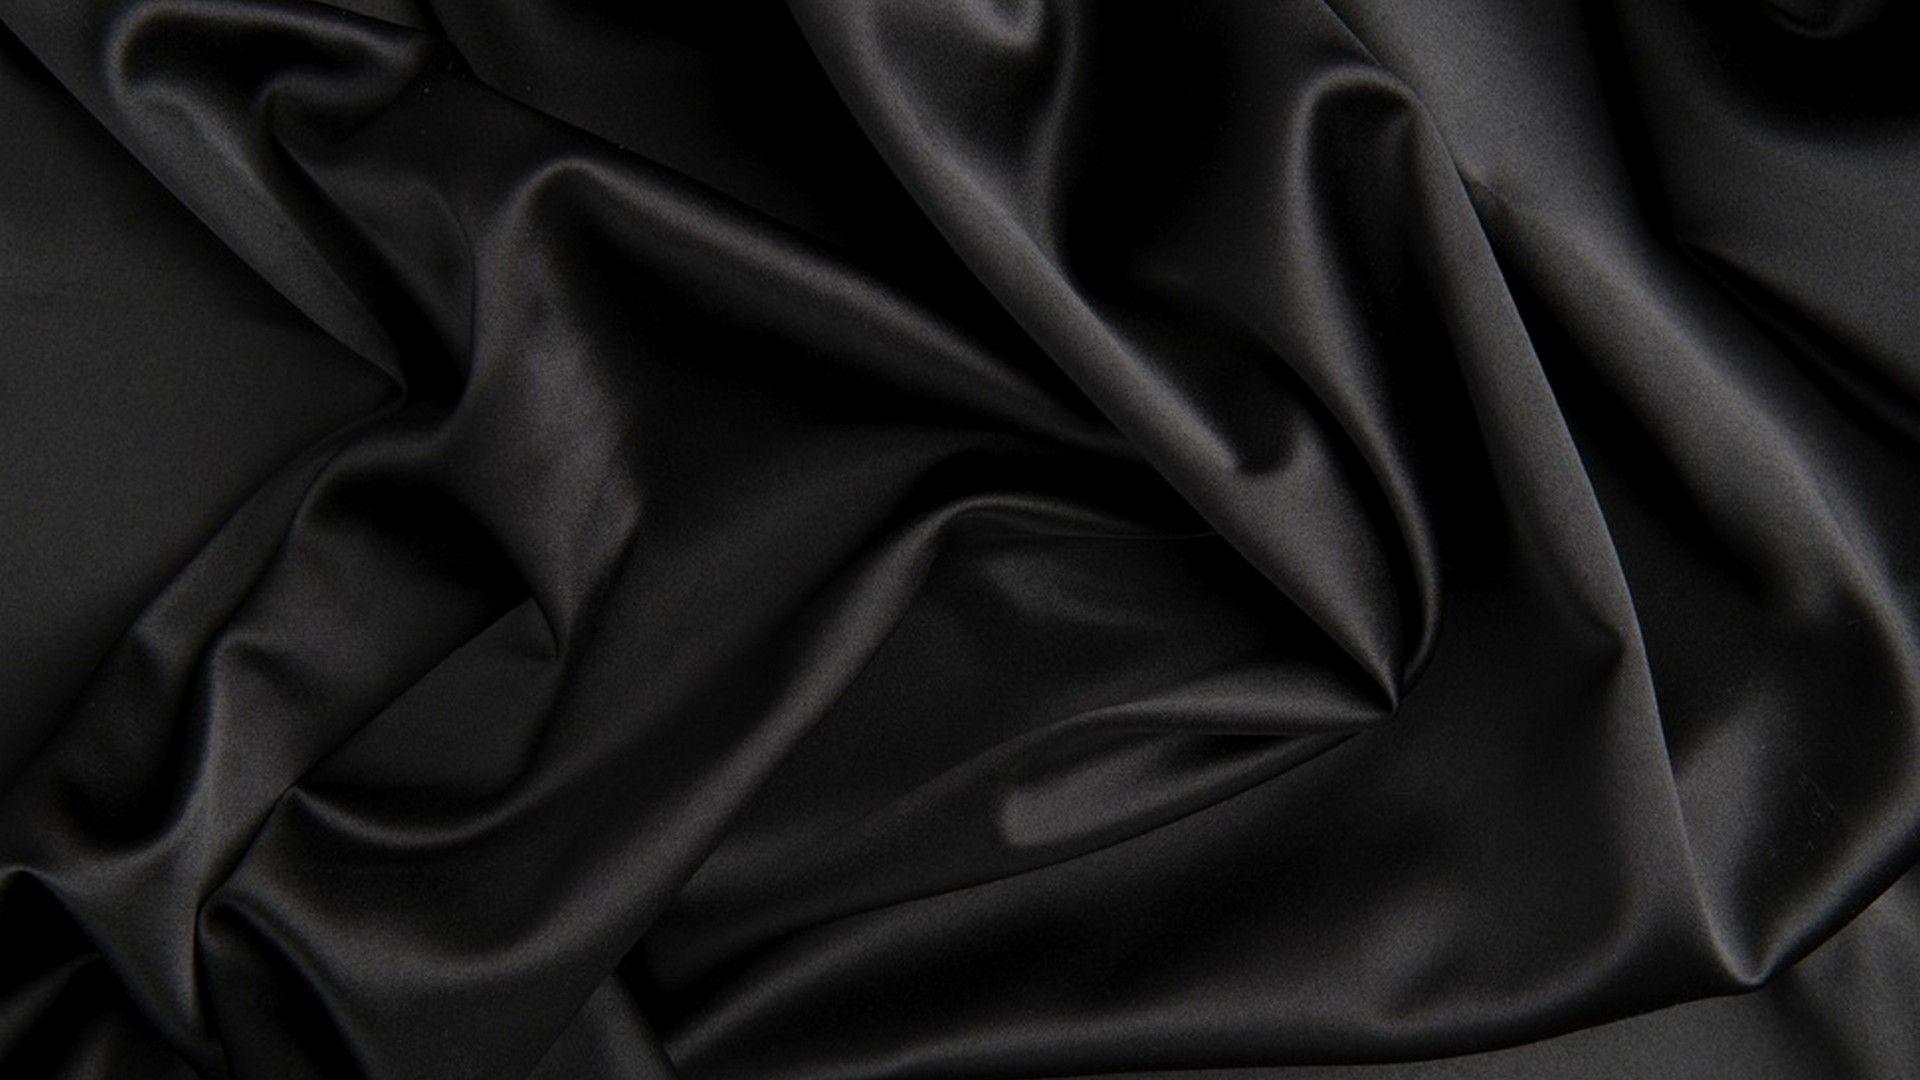 Black Silk Desktop Backgrounds 2021 Live Wallpaper Hd Black Silk Silk Satin Fabric Silk Fabric